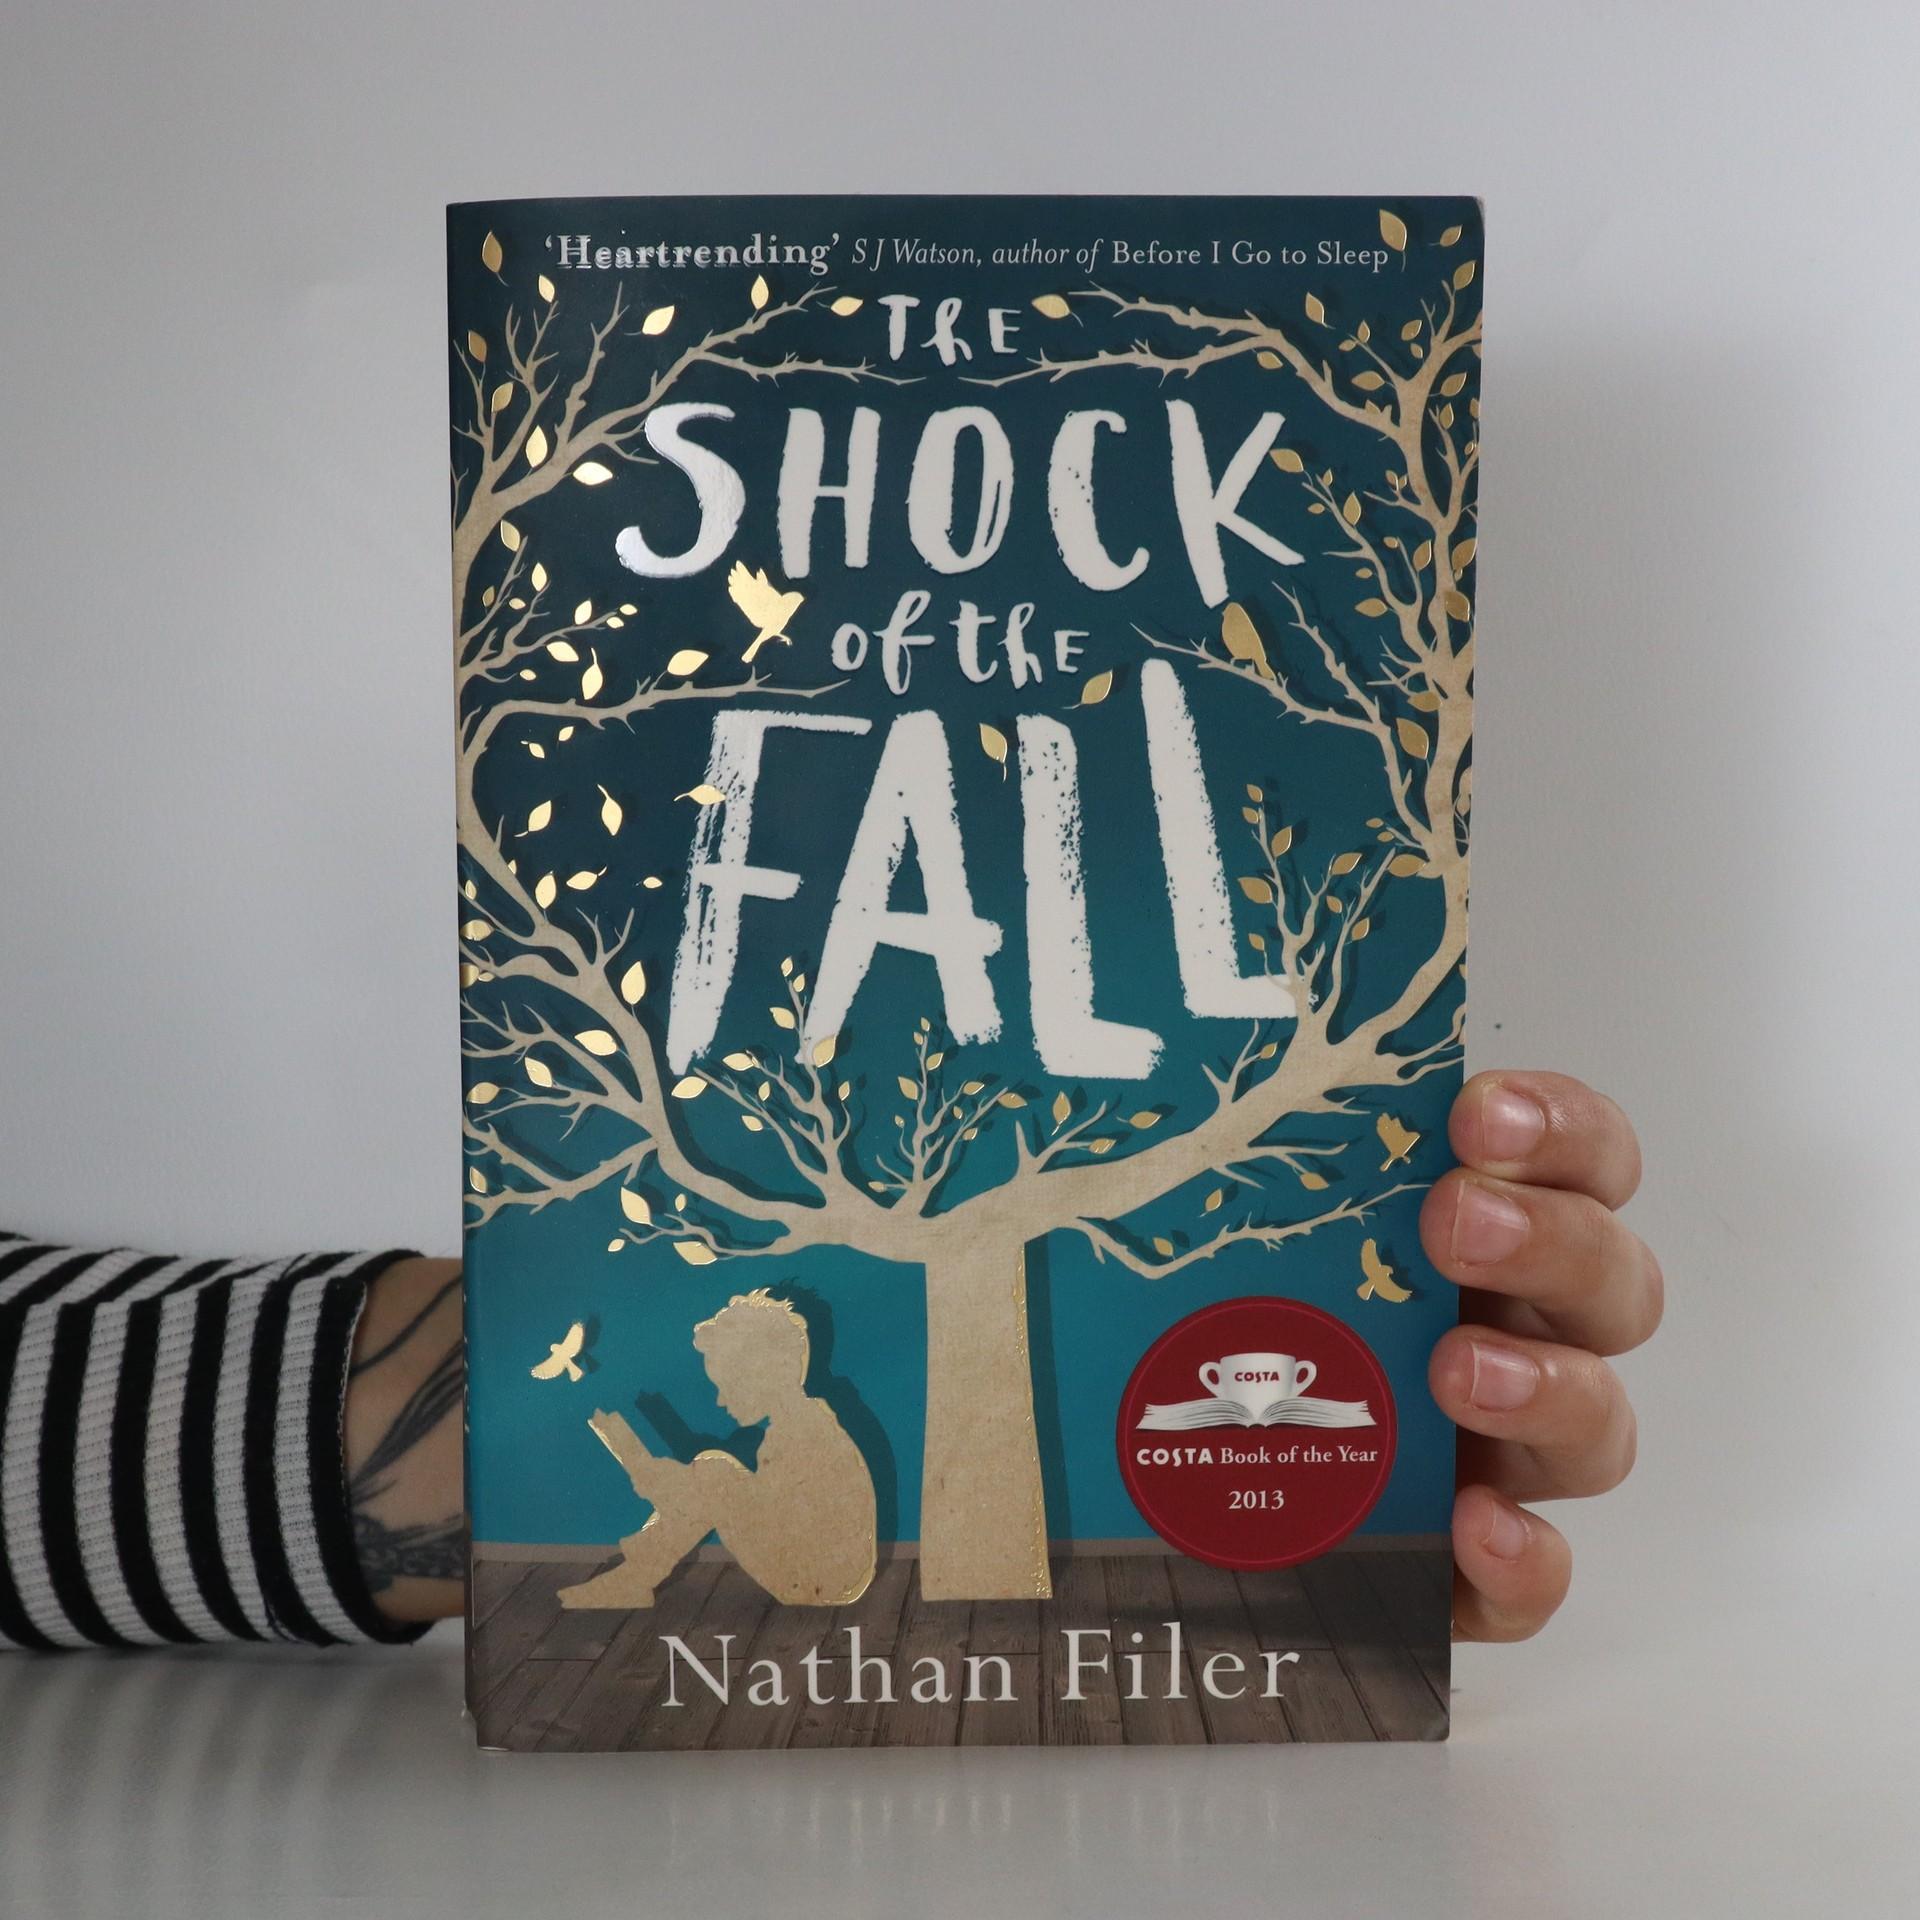 antikvární kniha The shock of the fall, 2014